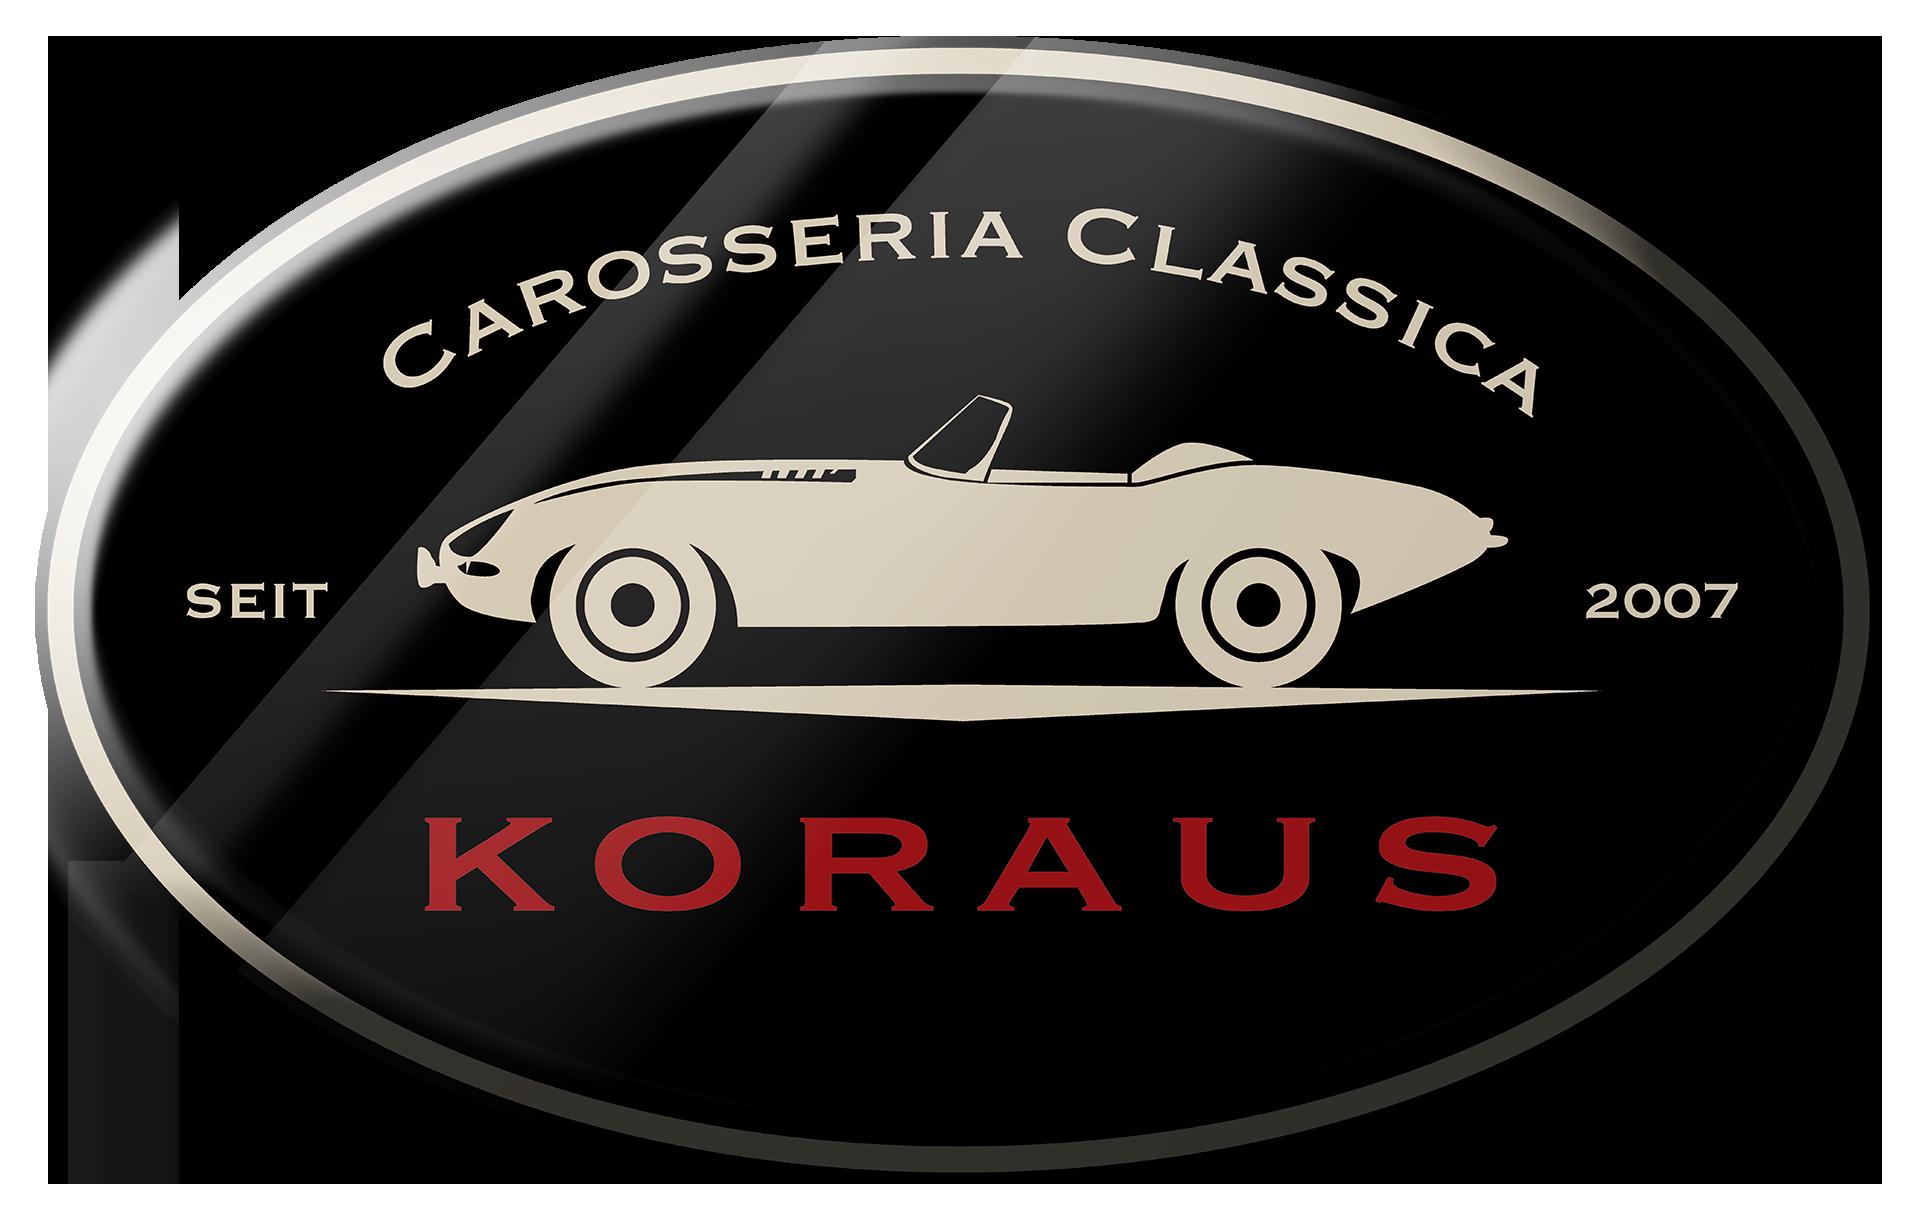 carosseria-classica-koraus